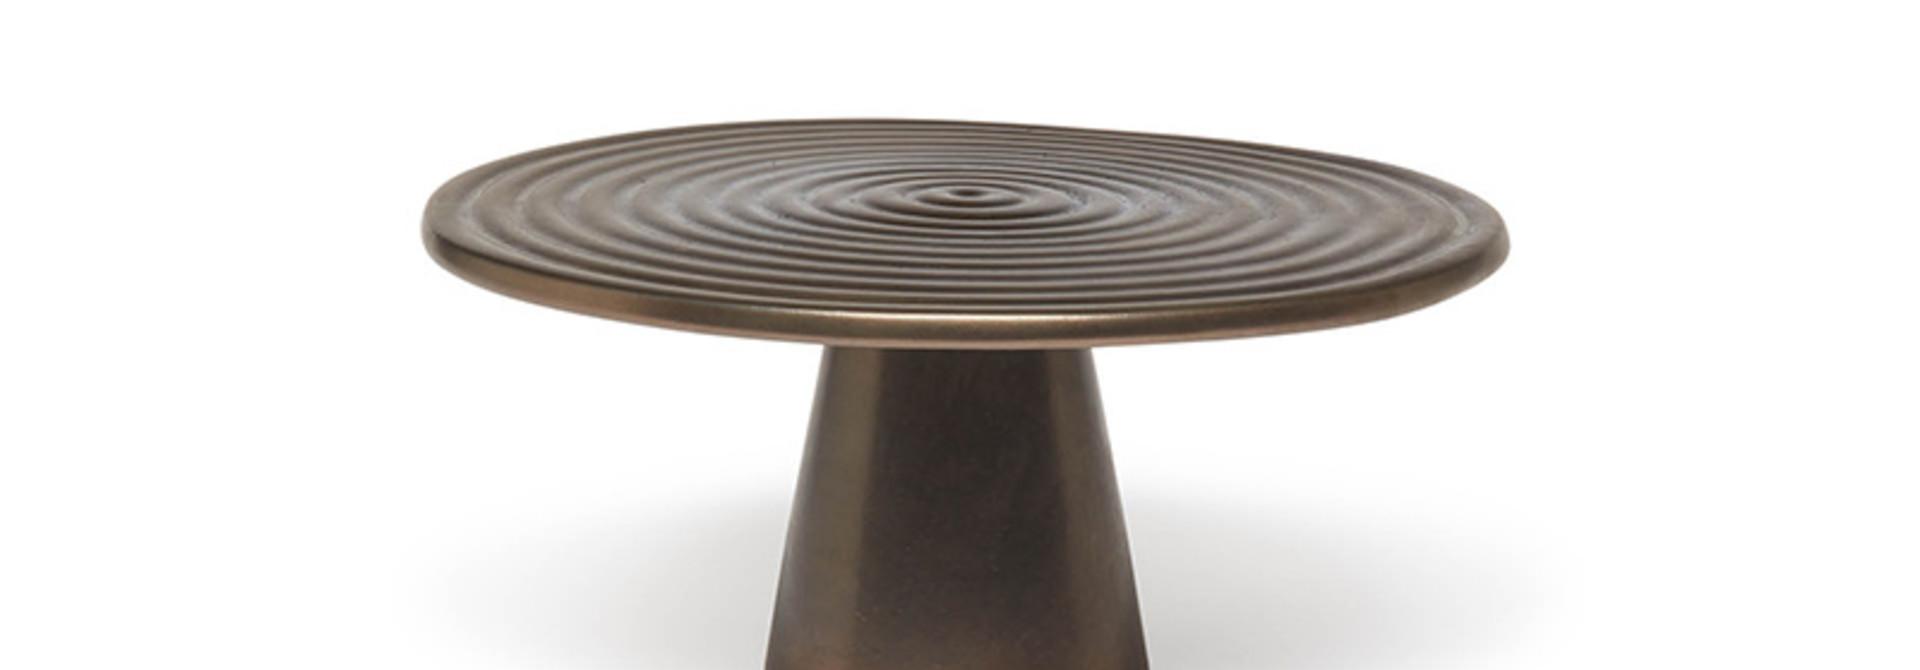 Food/Cake Stand - Platinum  Matt - Medium